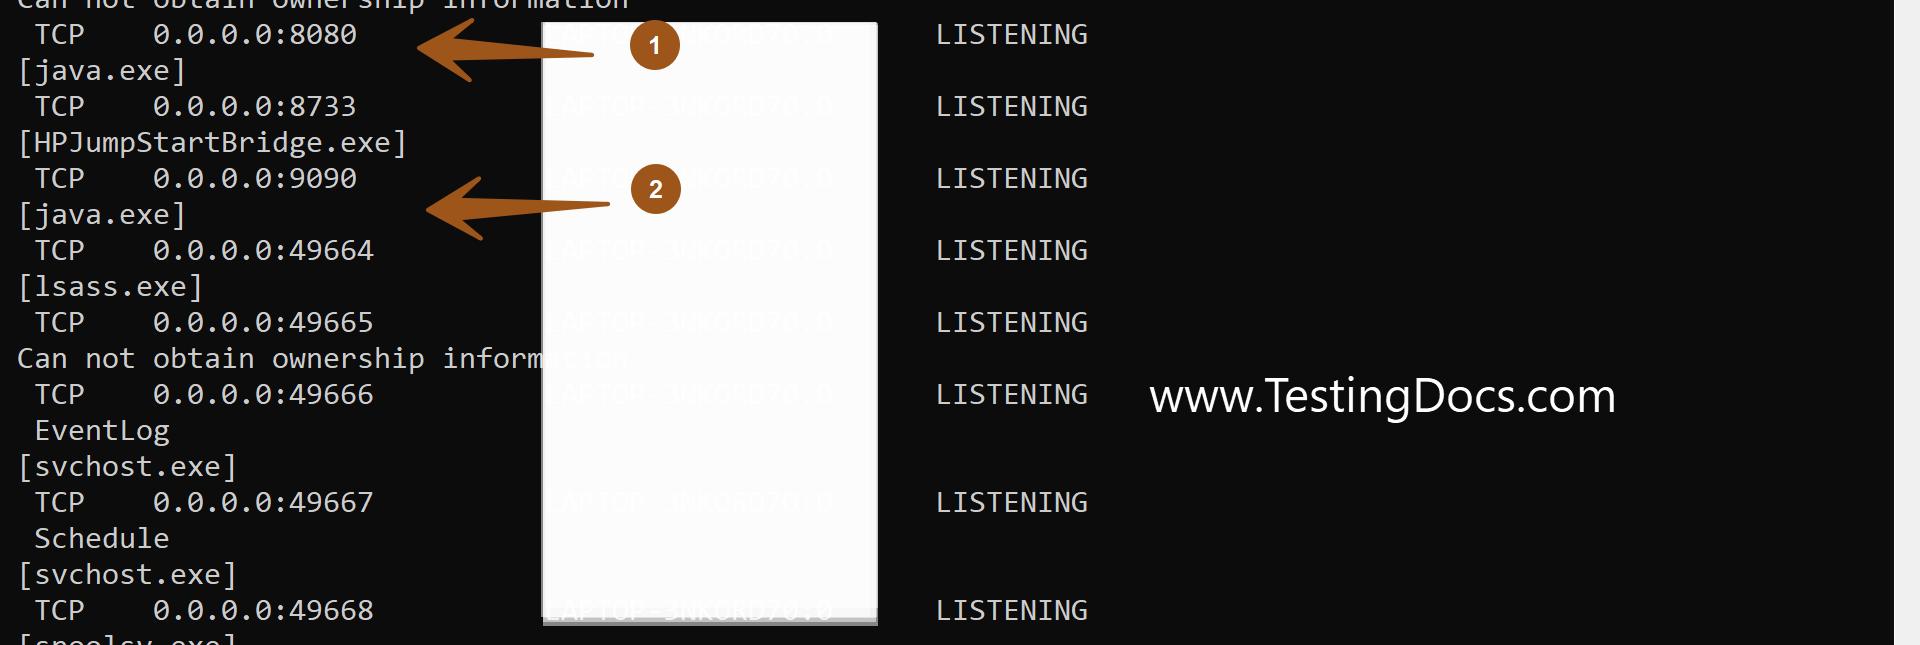 Listening Ports On Windows Machine